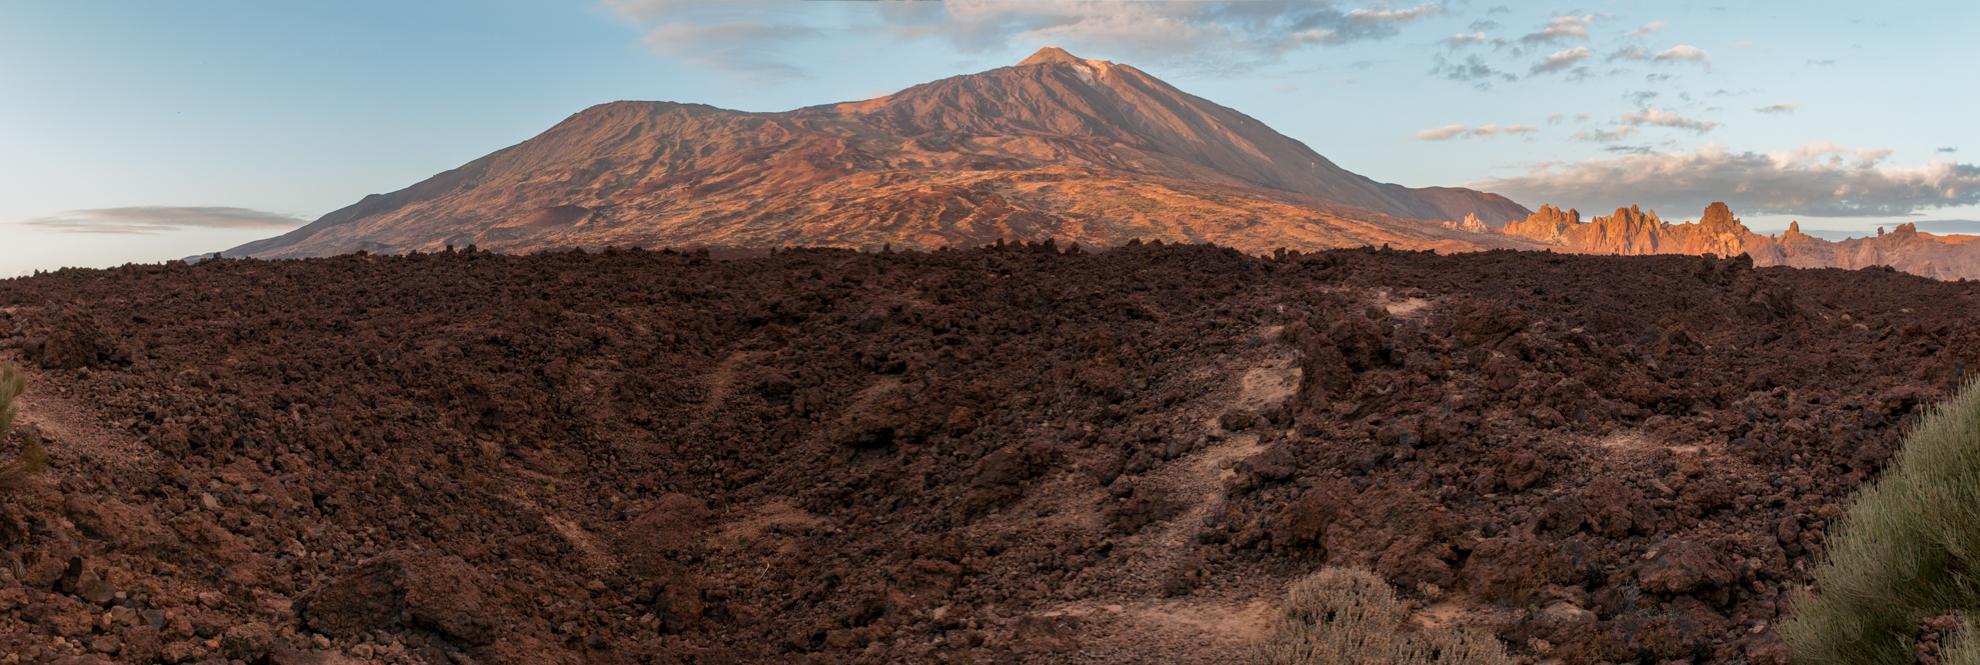 Tenerife-171116-7064.jpg